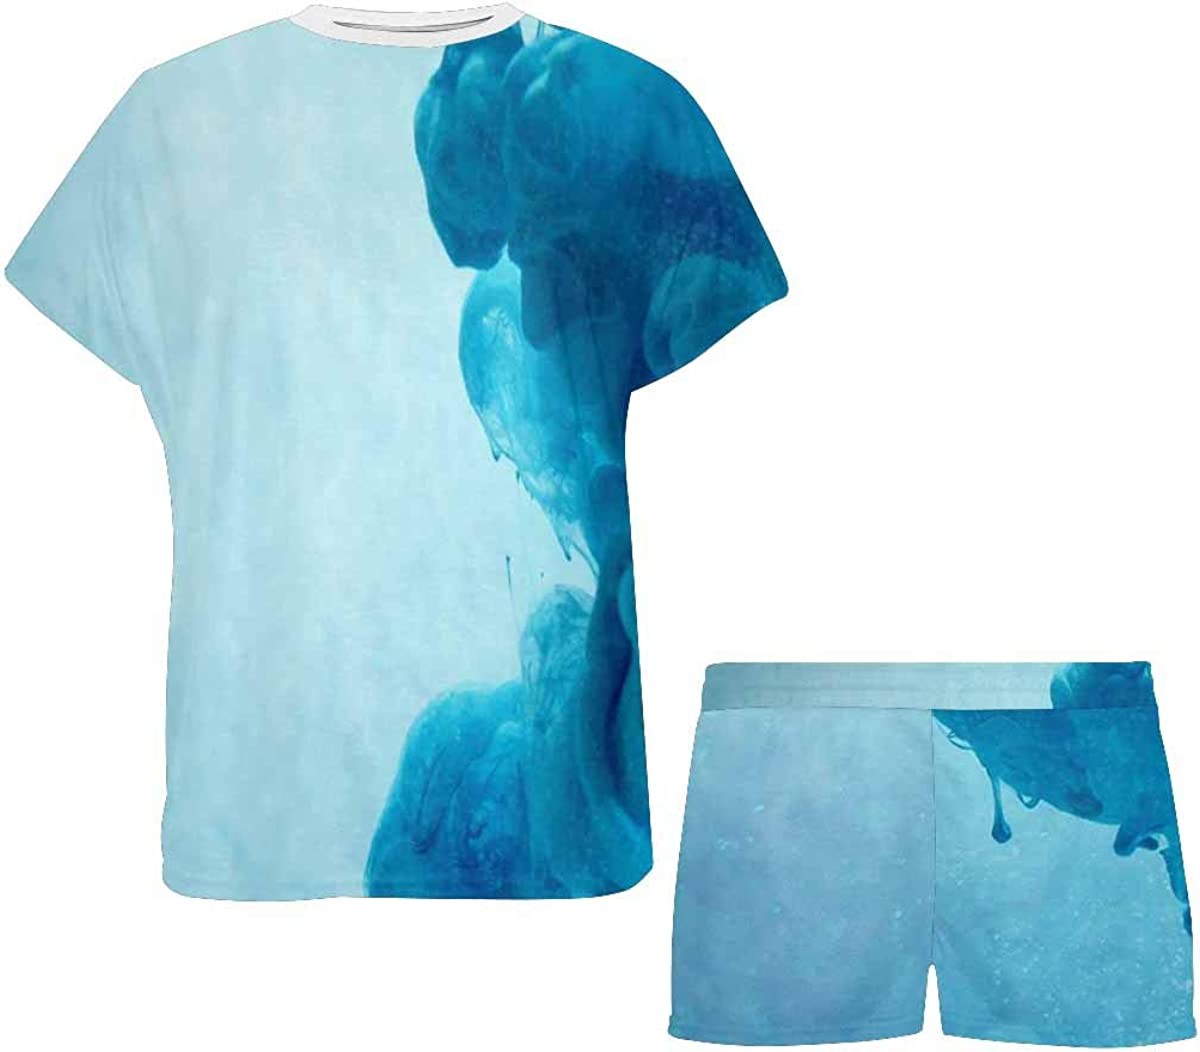 INTERESTPRINT Blue Color Cloud Square Cut Women's Breathable 2 Piece Shorts Pajama Sleepwear Set